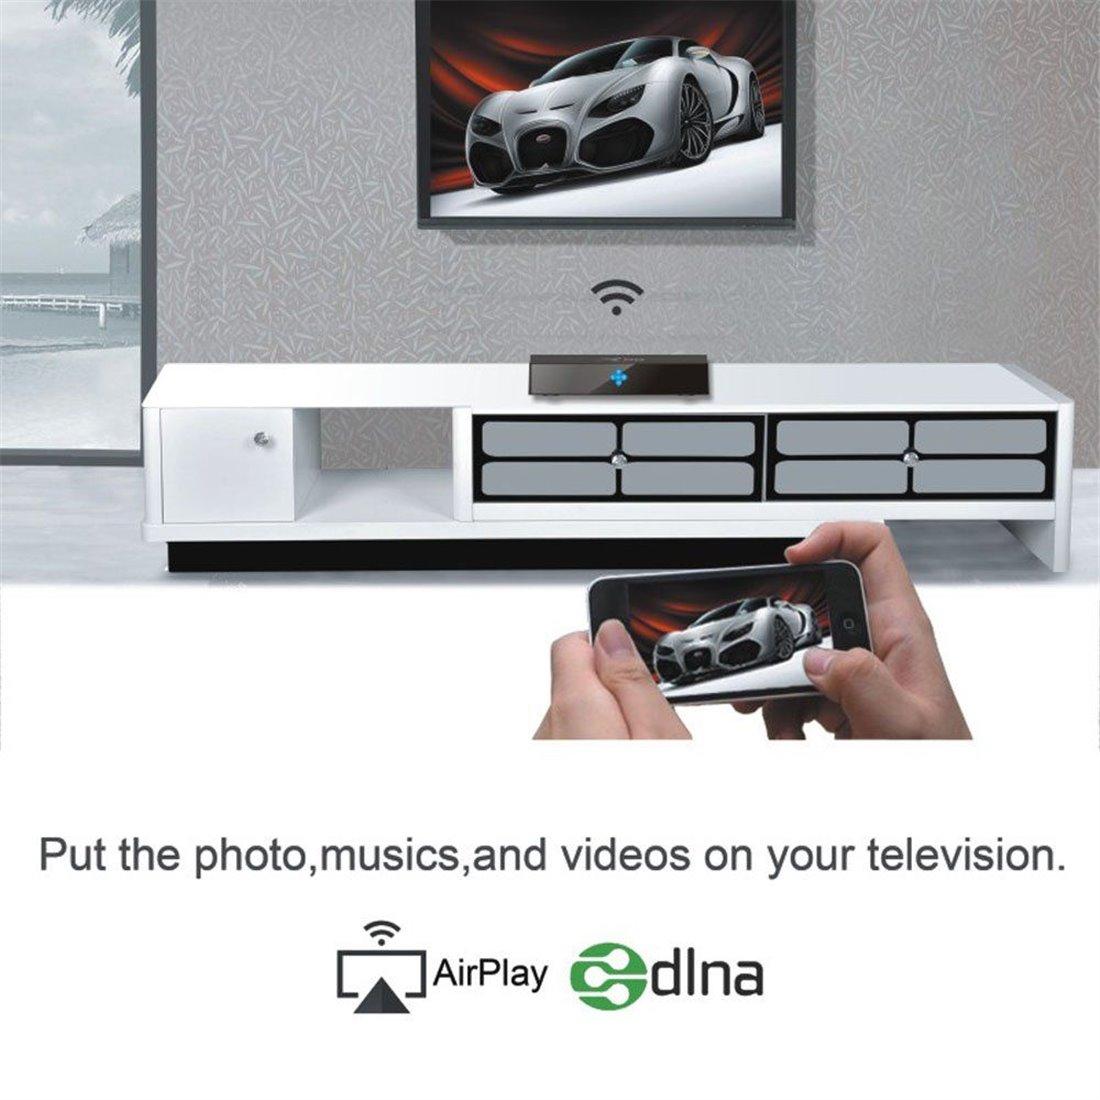 VIGICA X96 TV Box Android 6.0 Marshmallow Amlogic S905X Quad Core 2G 16G Smart TV Box 4K WIFI DLNA